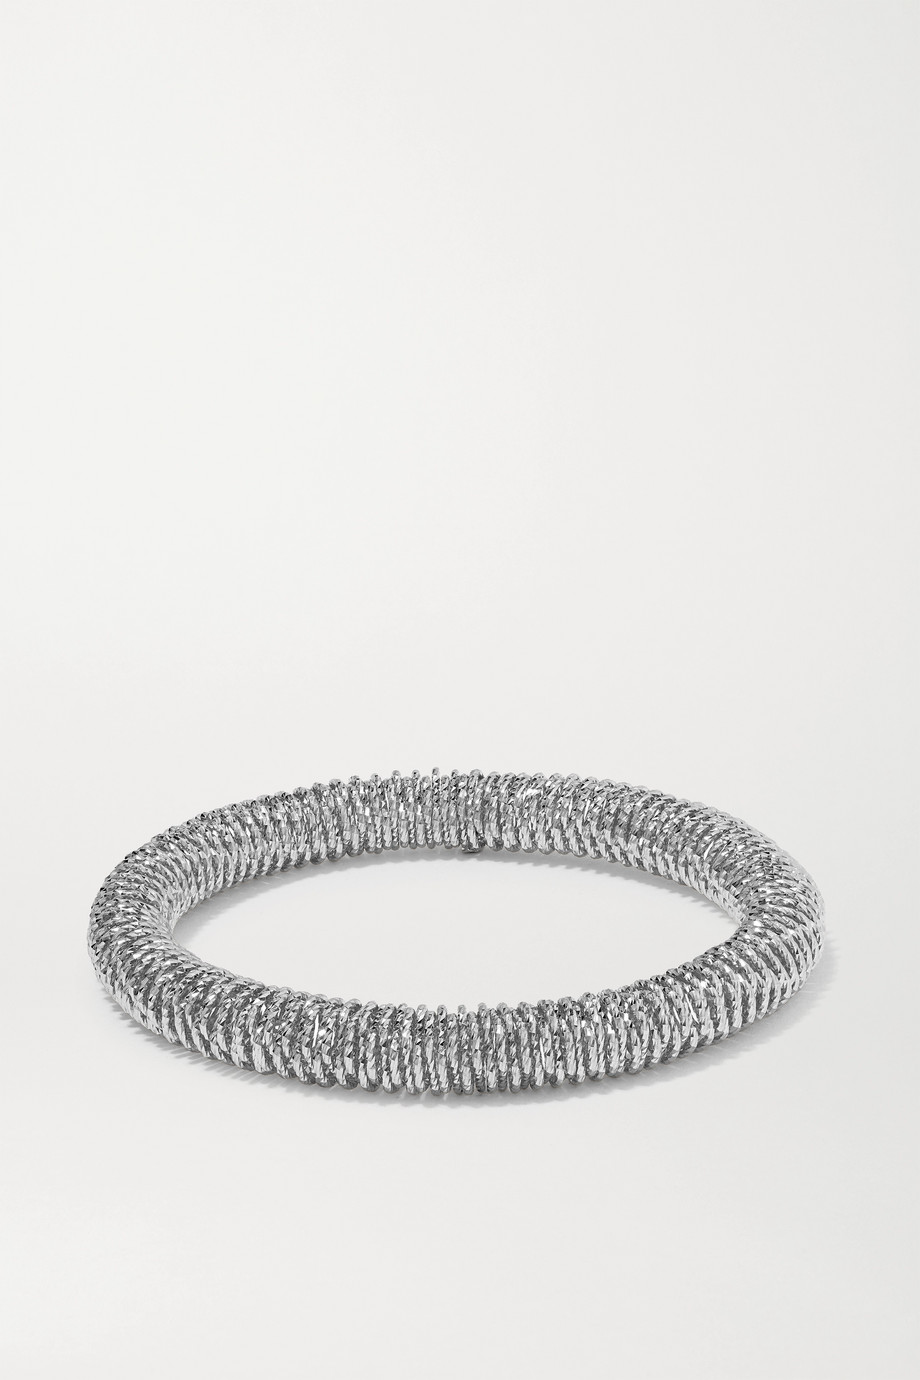 Carolina Bucci K.I.S.S. Small Armband aus 18 Karat Weißgold